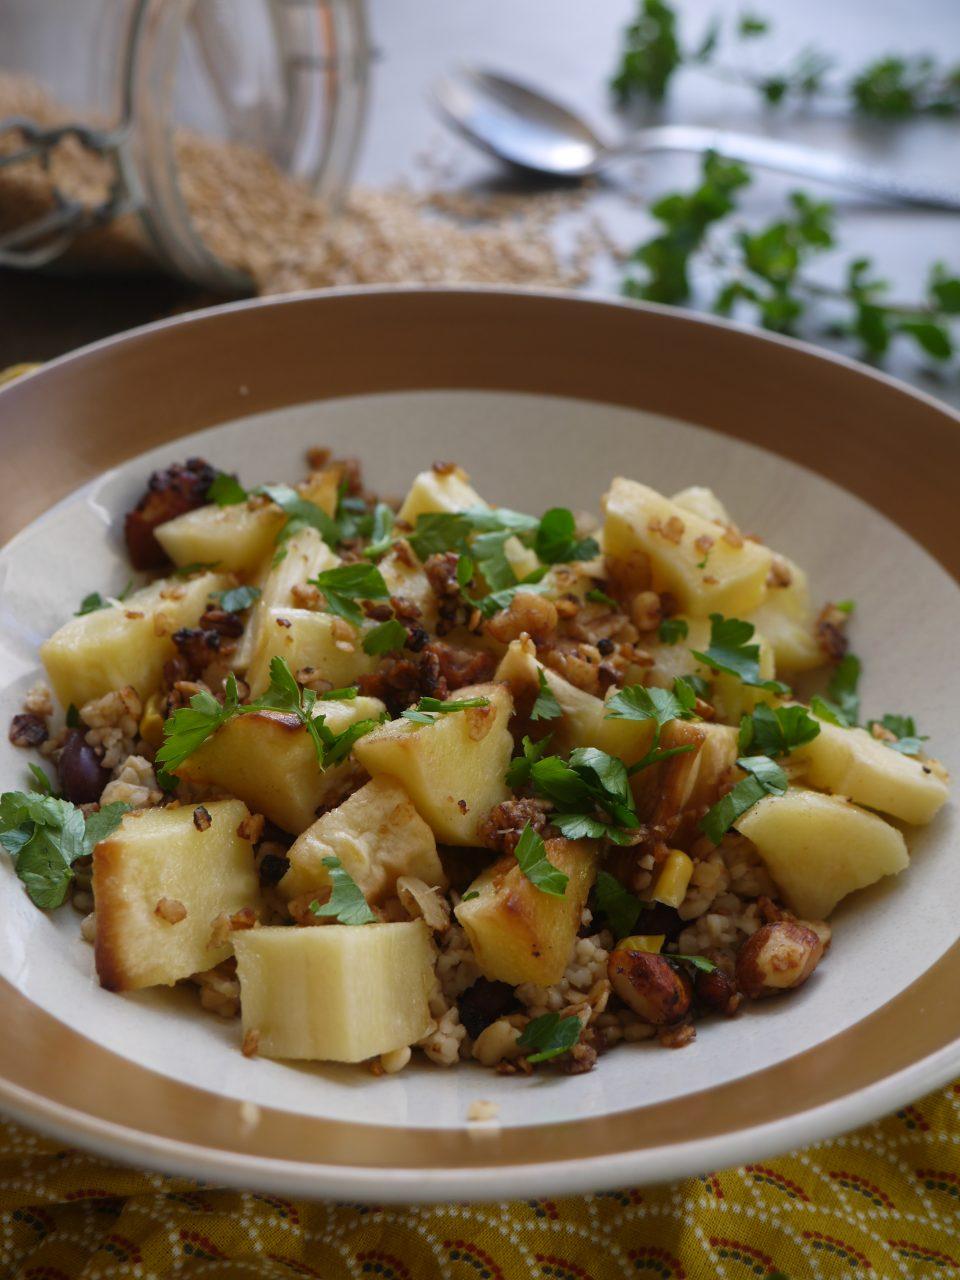 salade-panais-epeautre-betty